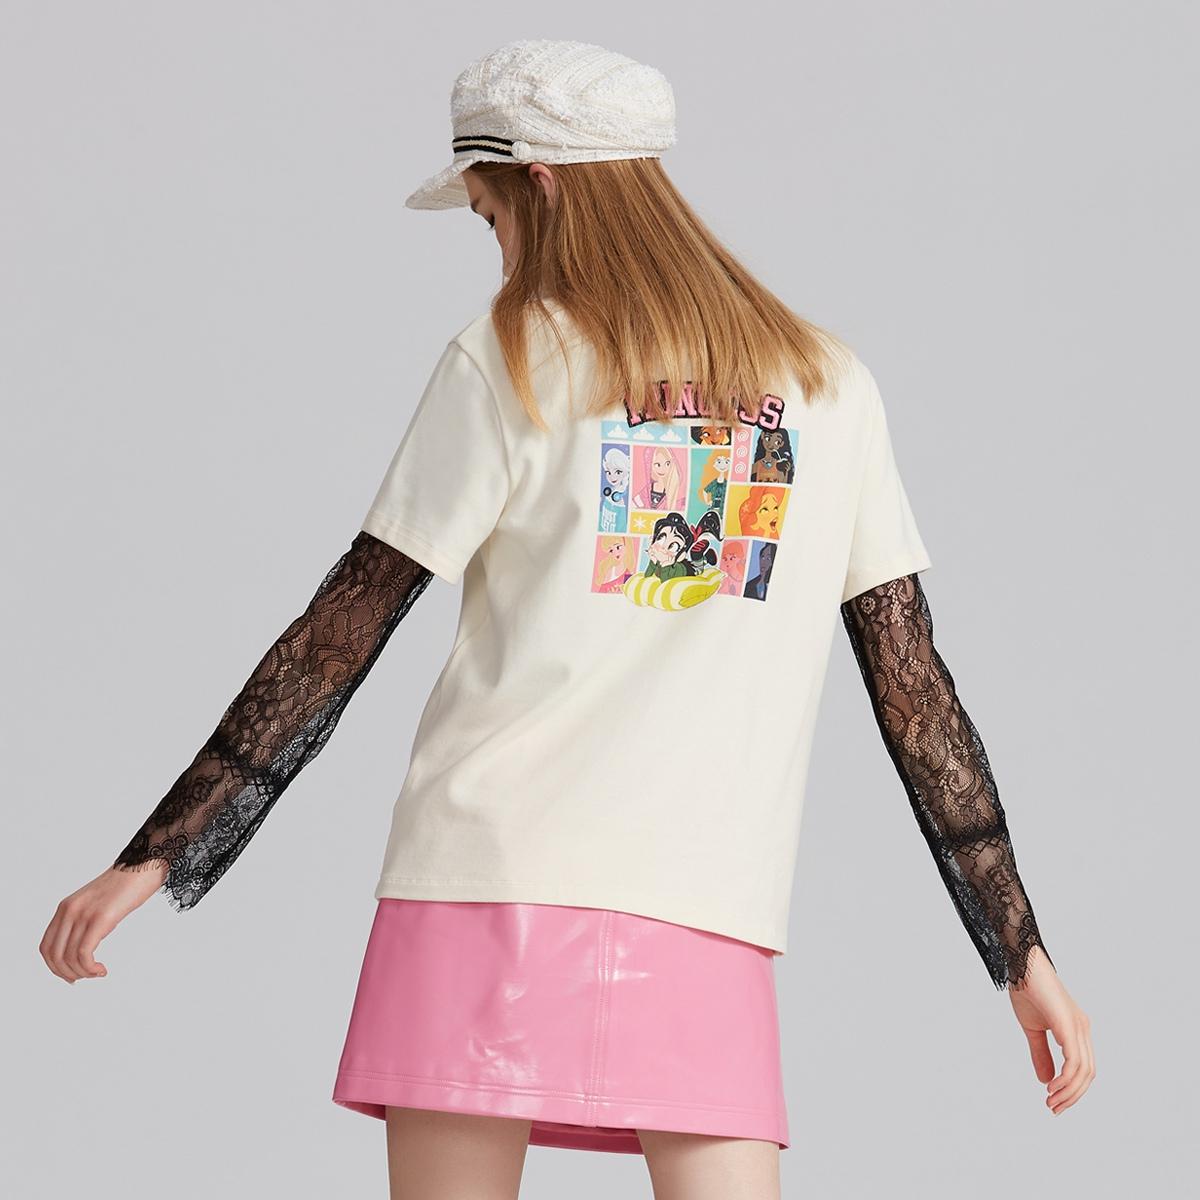 FIVE PLUS女冬装chic字母宽松T恤女短袖刺绣上衣套头圆领棉质